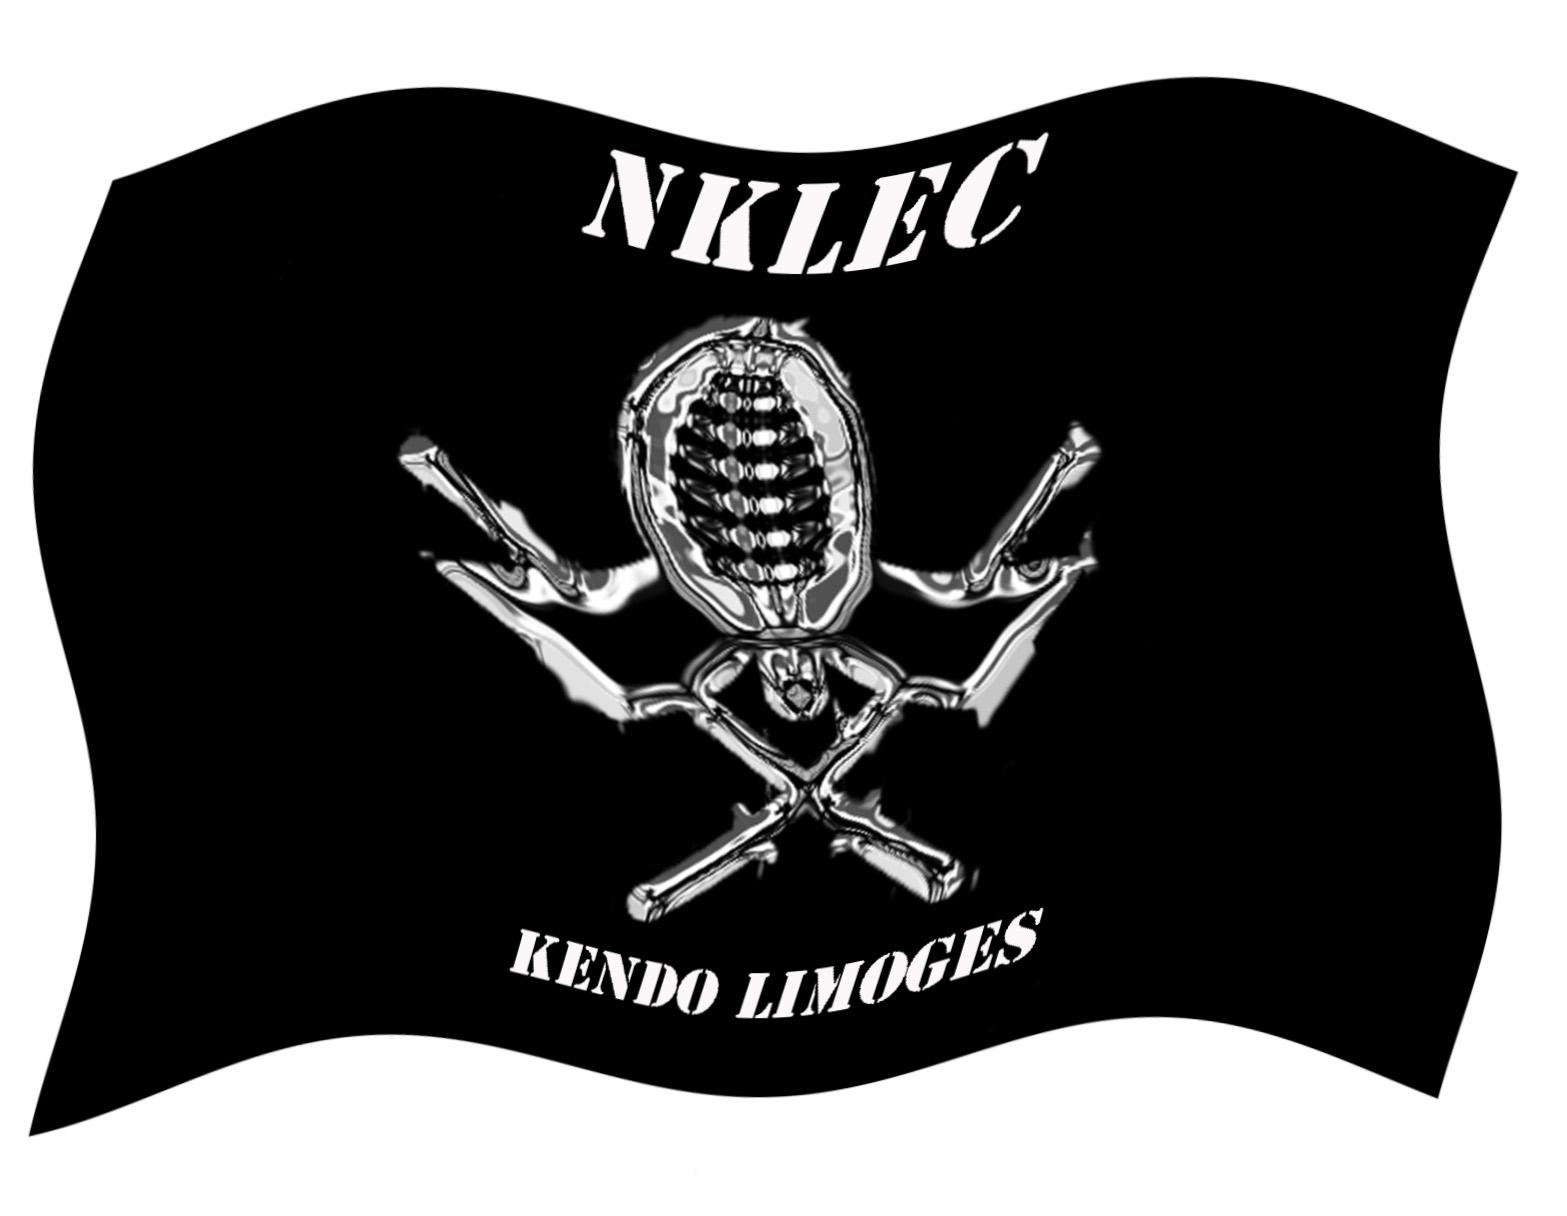 Logo Kendo (2)